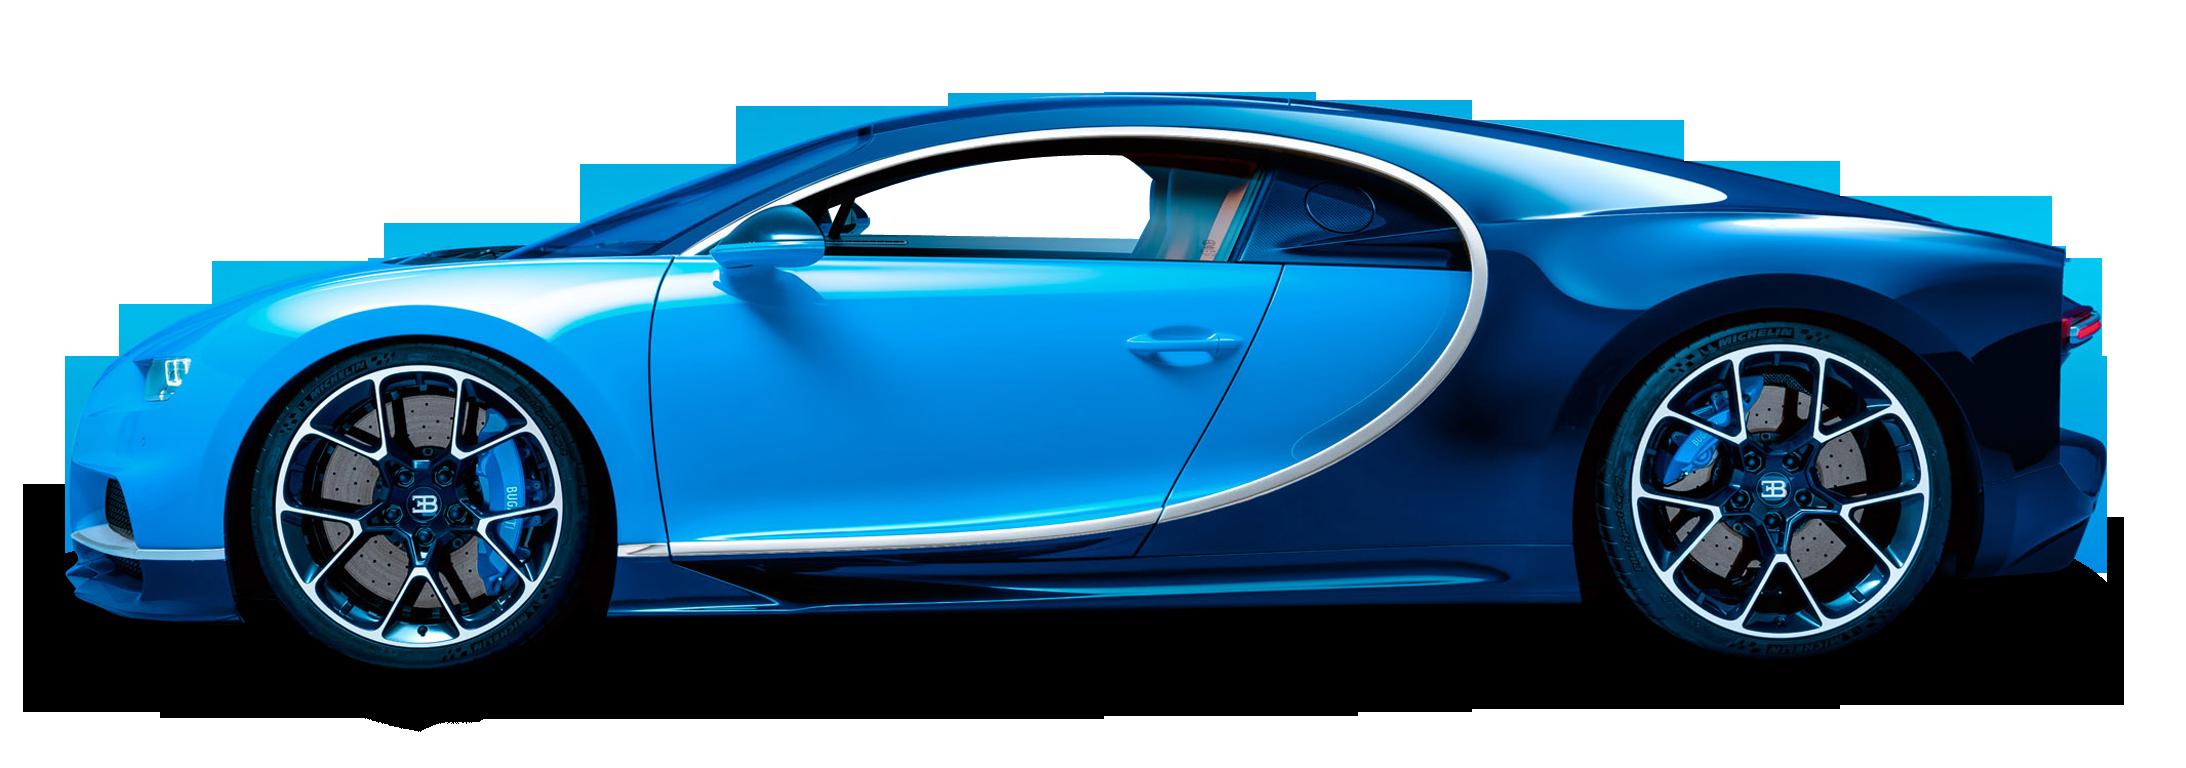 Bugatti PNG - 10263